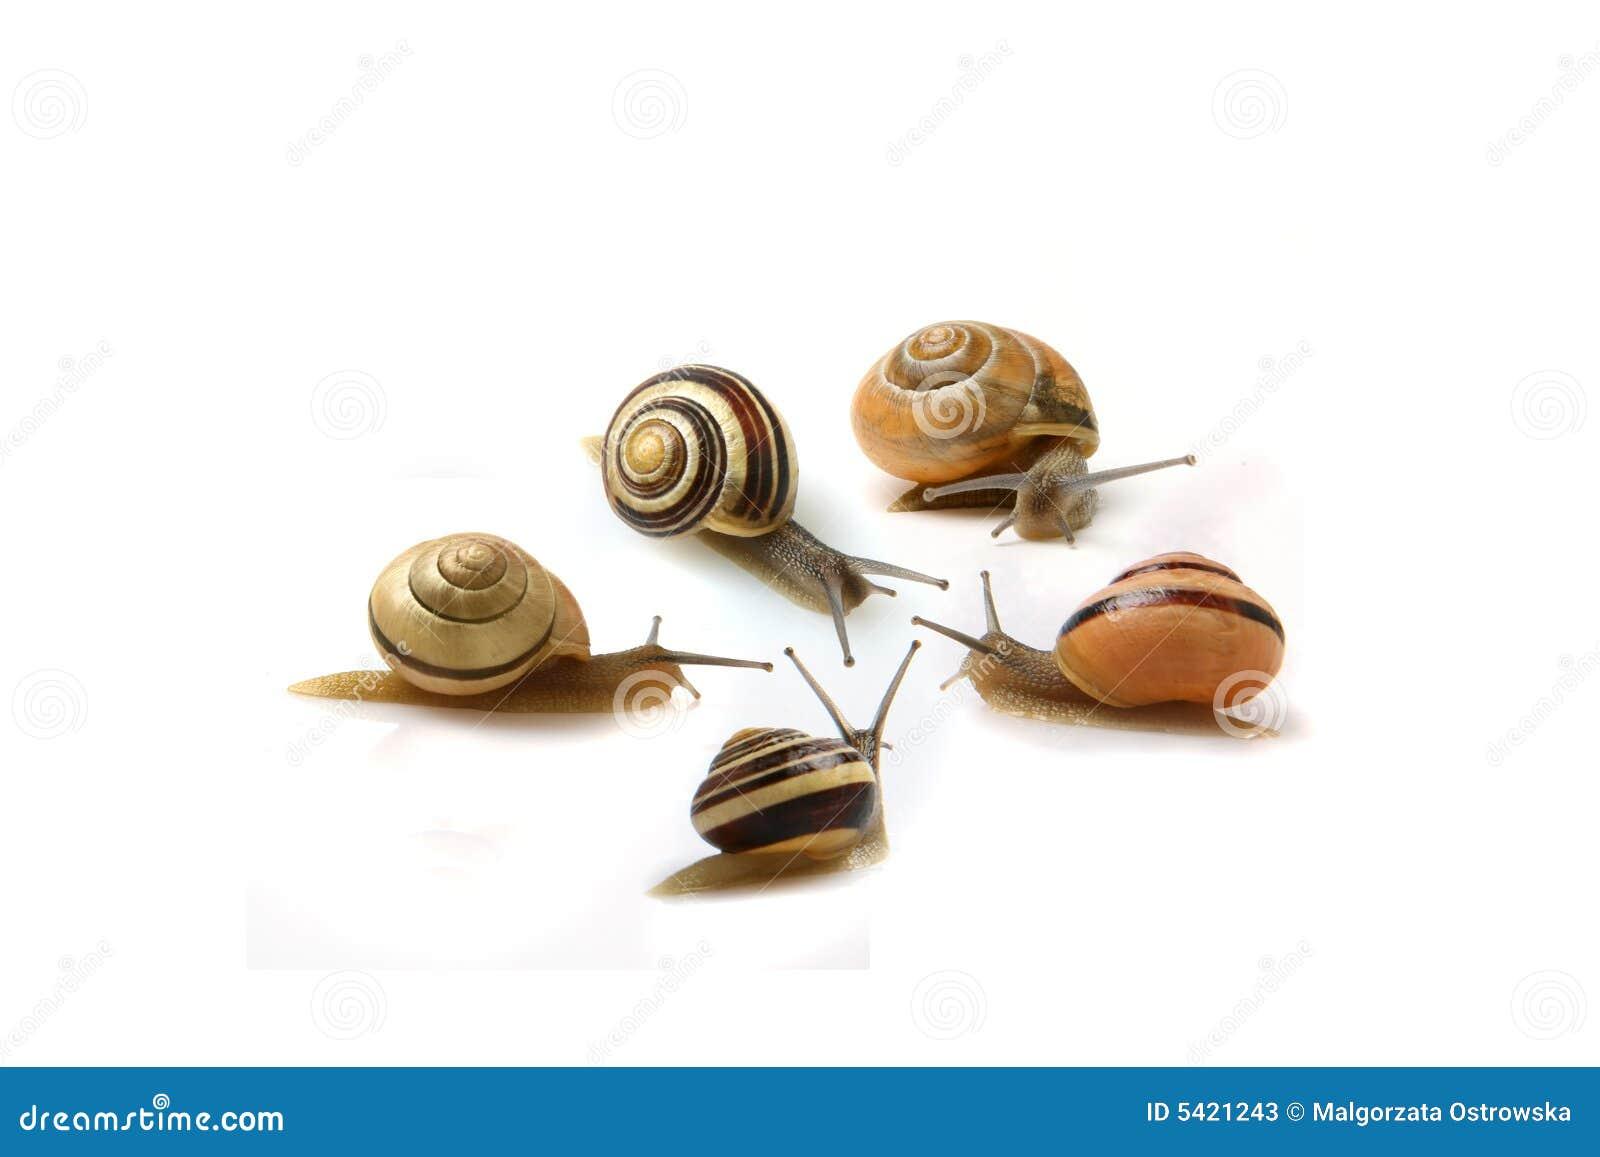 Snails meeting